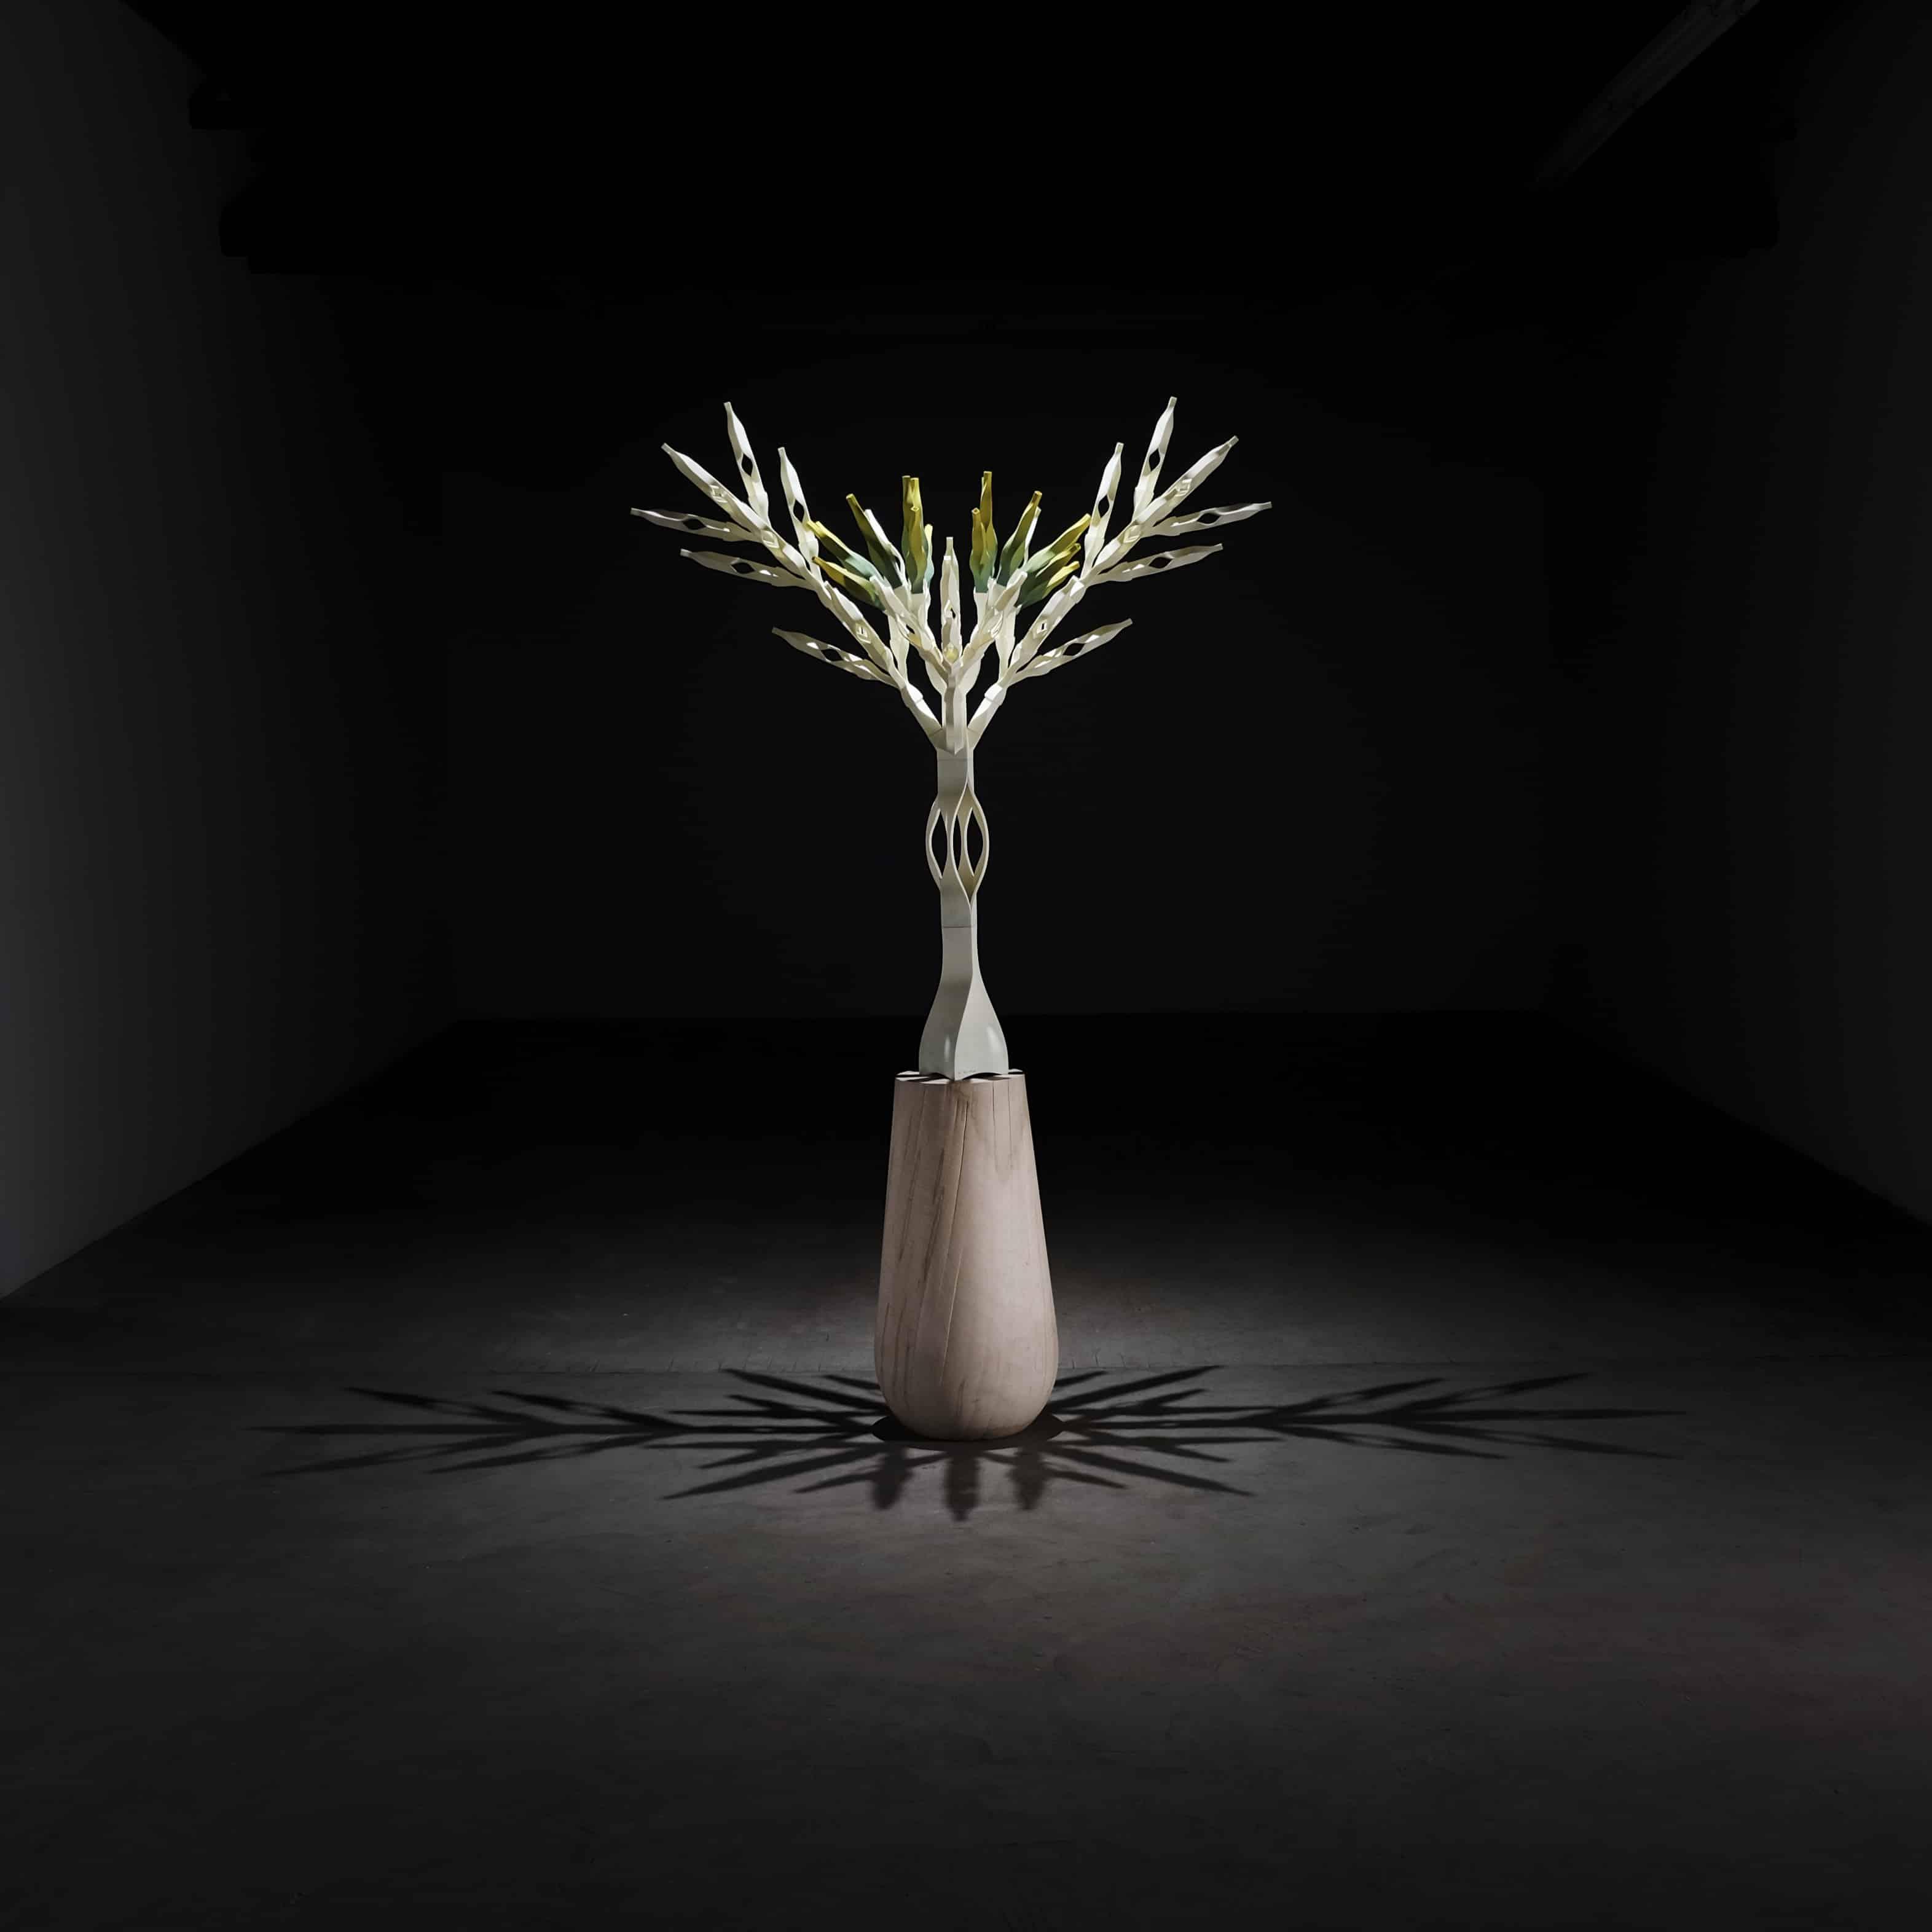 033116 And Tree of Life. Compositional Study Six Ambiguous Symmetree 2016, Image courtesy of Se Yoon Park